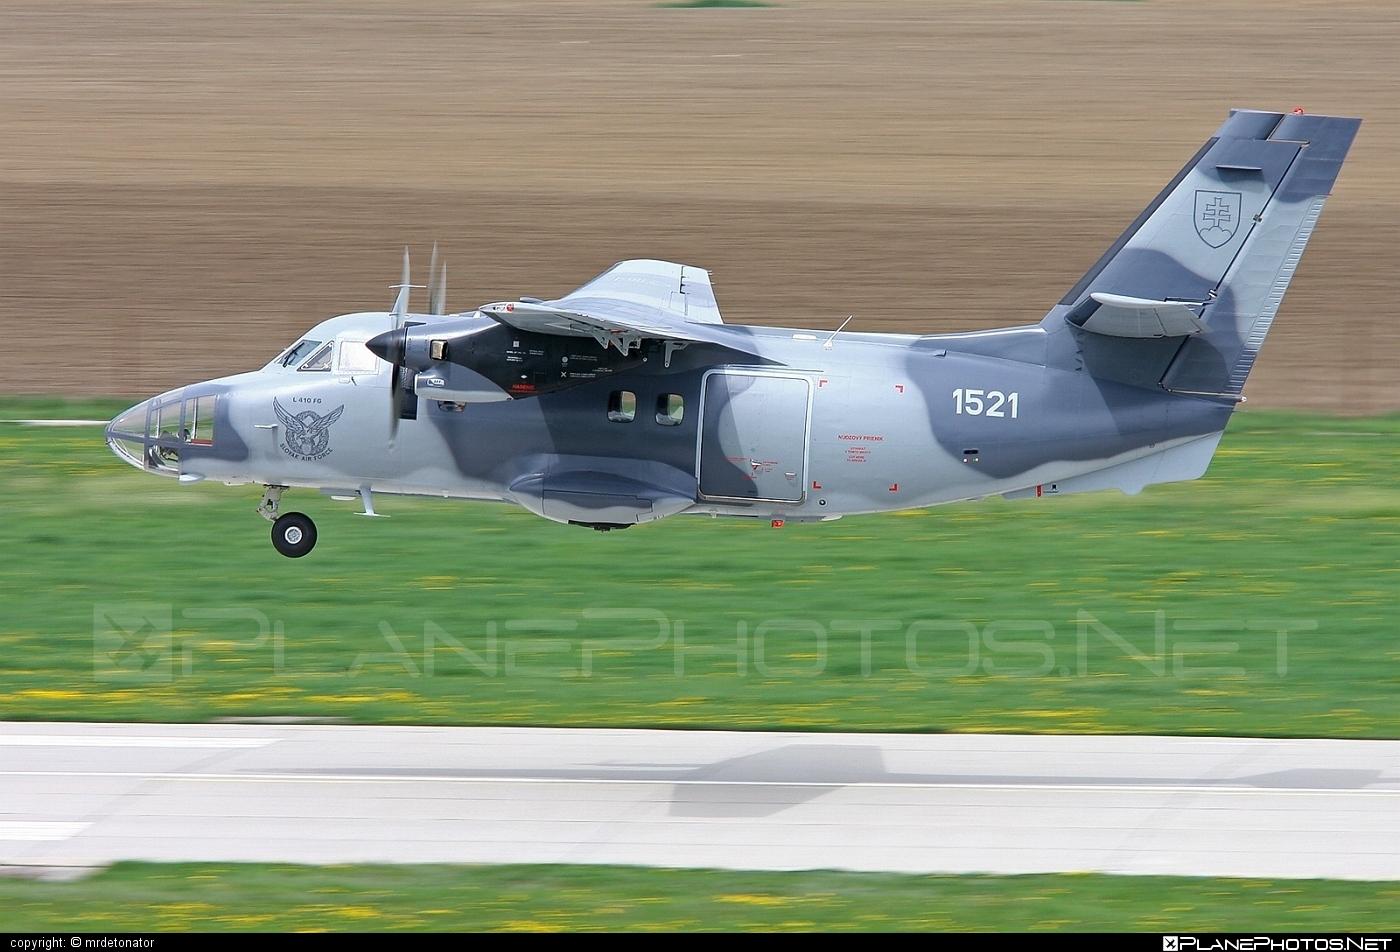 Let L-410FG Turbolet - 1521 operated by Vzdušné sily OS SR (Slovak Air Force) #L410 #L410Turbolet #L410fg #L410fgTurbolet #let #slovakairforce #turbolet #vzdusnesilyossr